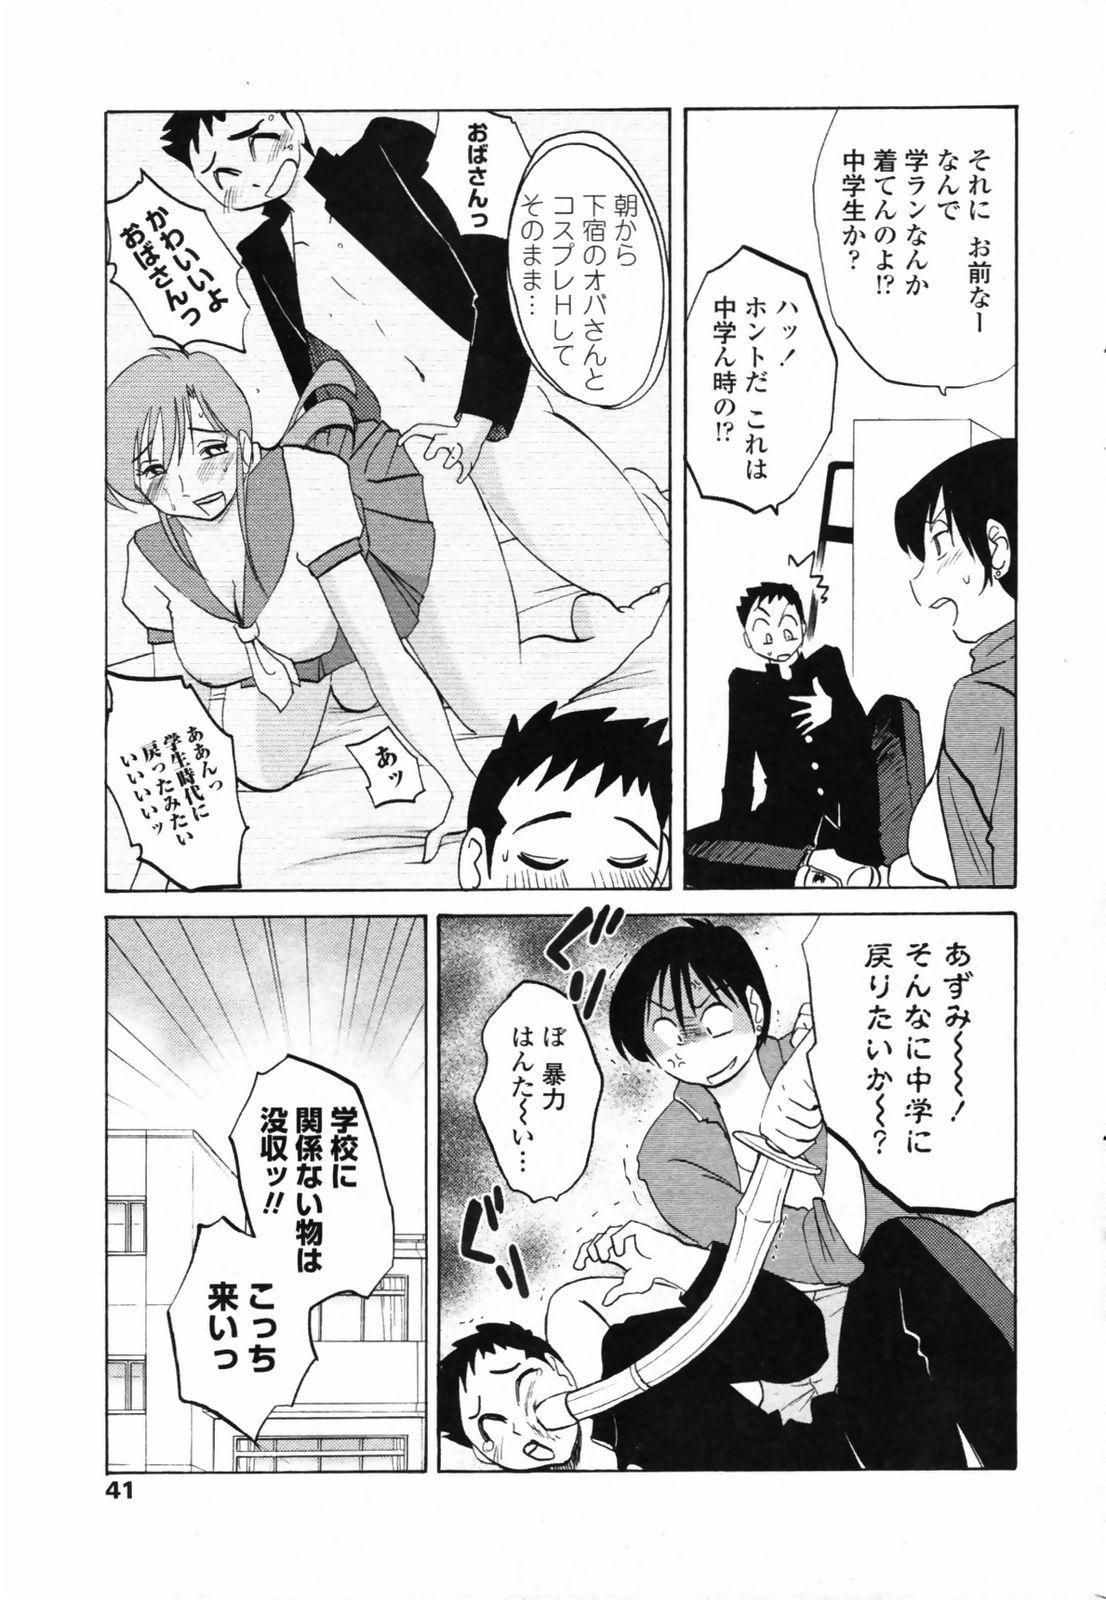 [Tsuyatsuya] Azumi-kun to Issho chapt.1-5 (Comic Penguin Club) 33